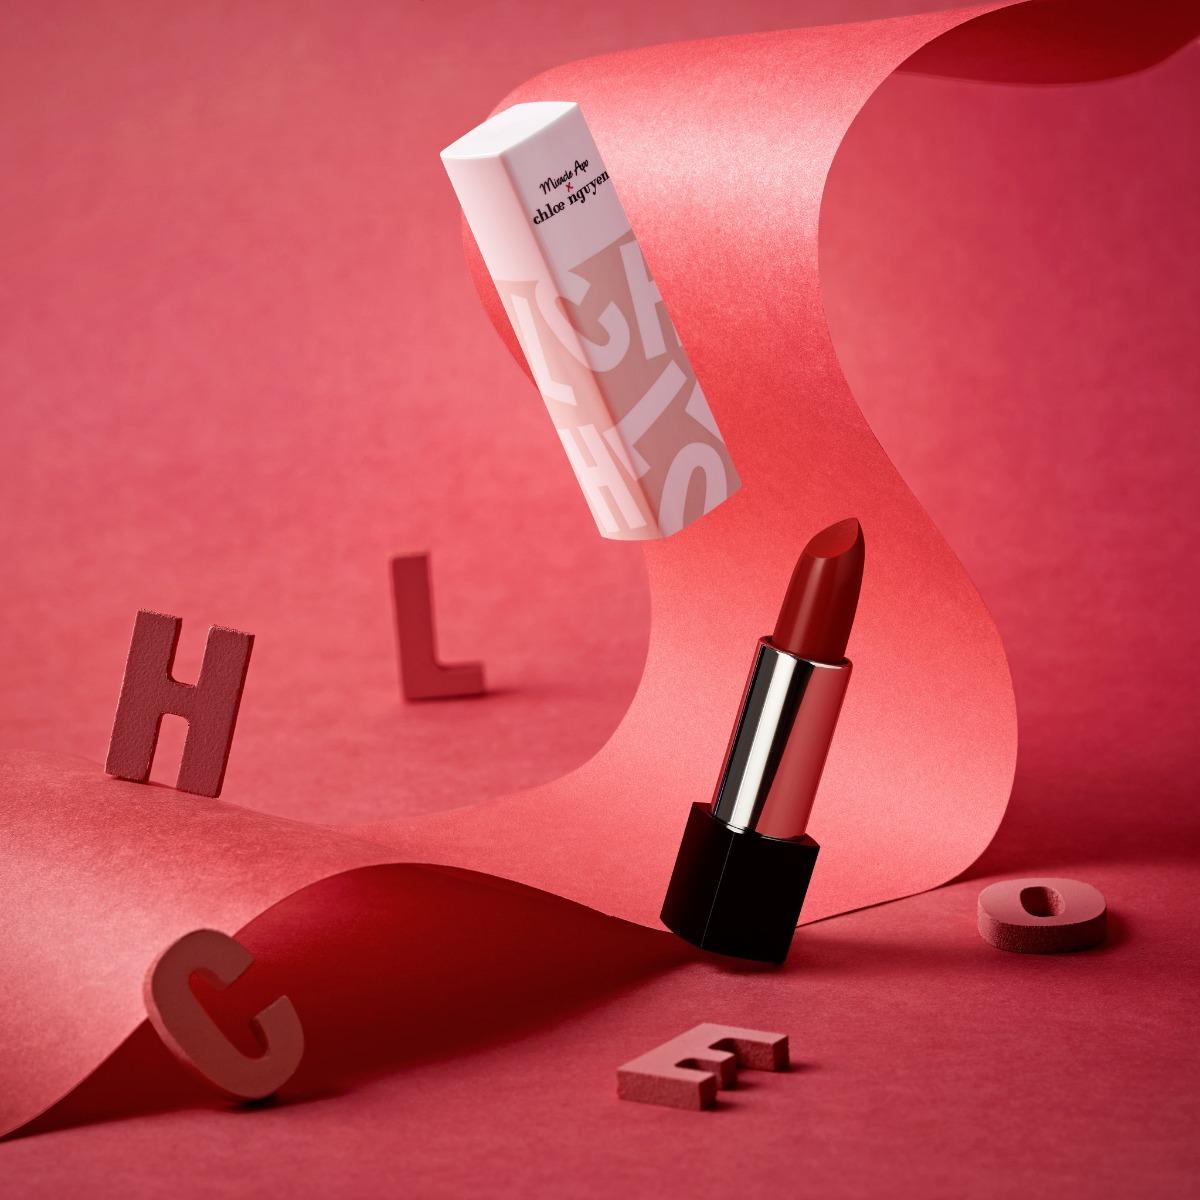 Son Thỏi Miracle Apo x Chloe Nguyễn Silky Satin Lipstick #In Love Màu Đỏ Hồng